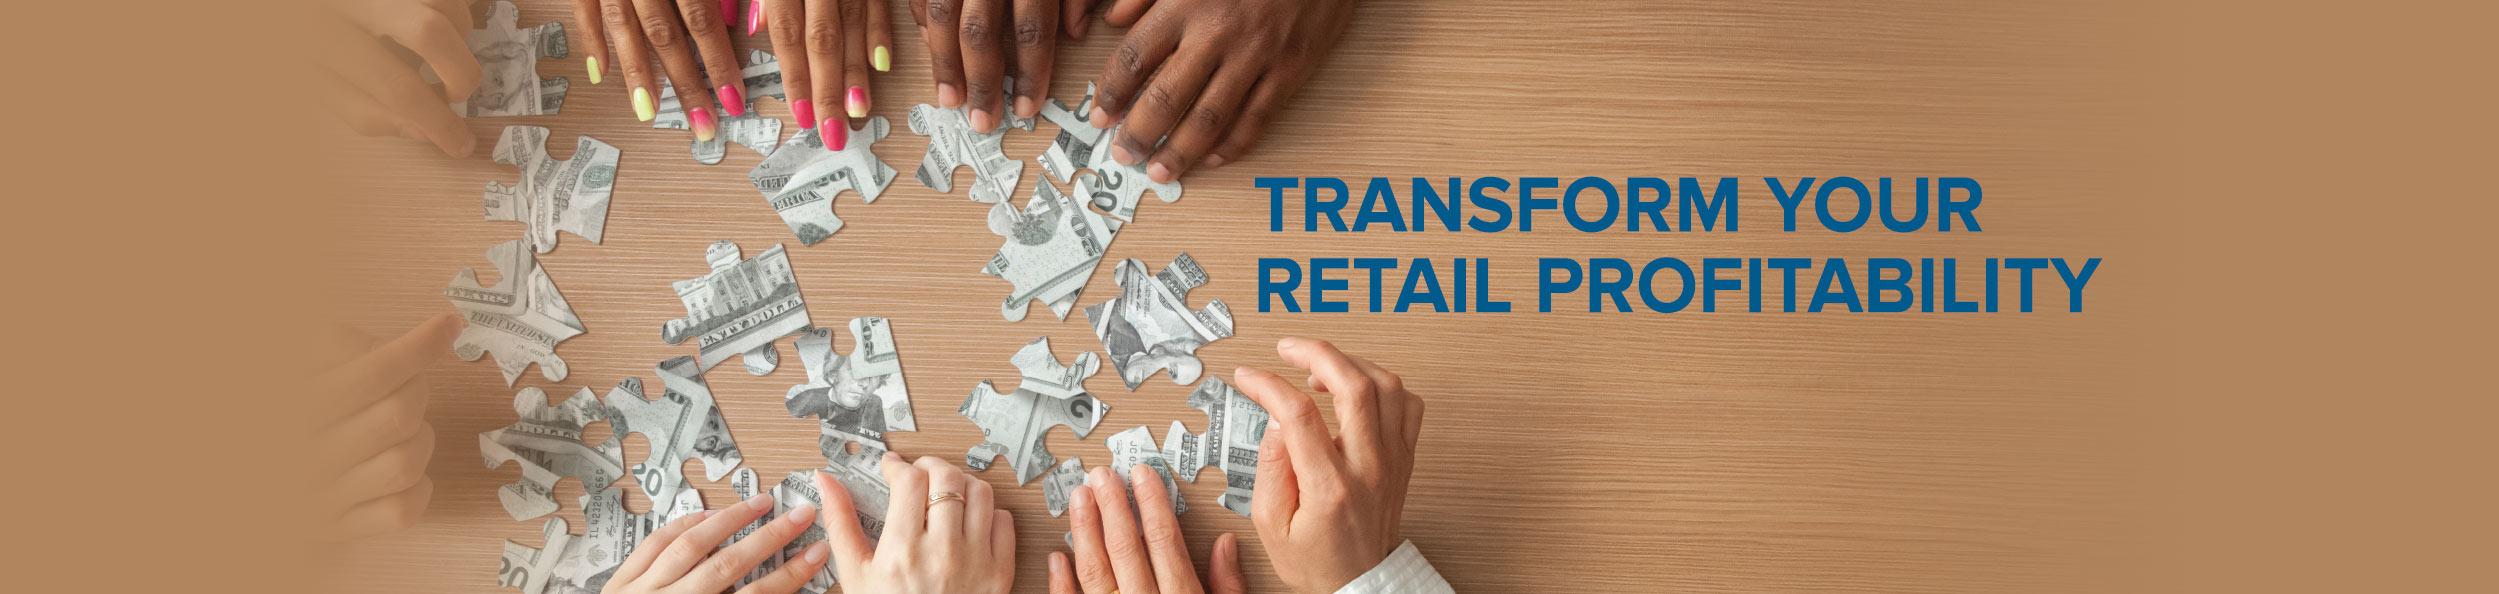 Transform Your Retail Profitability